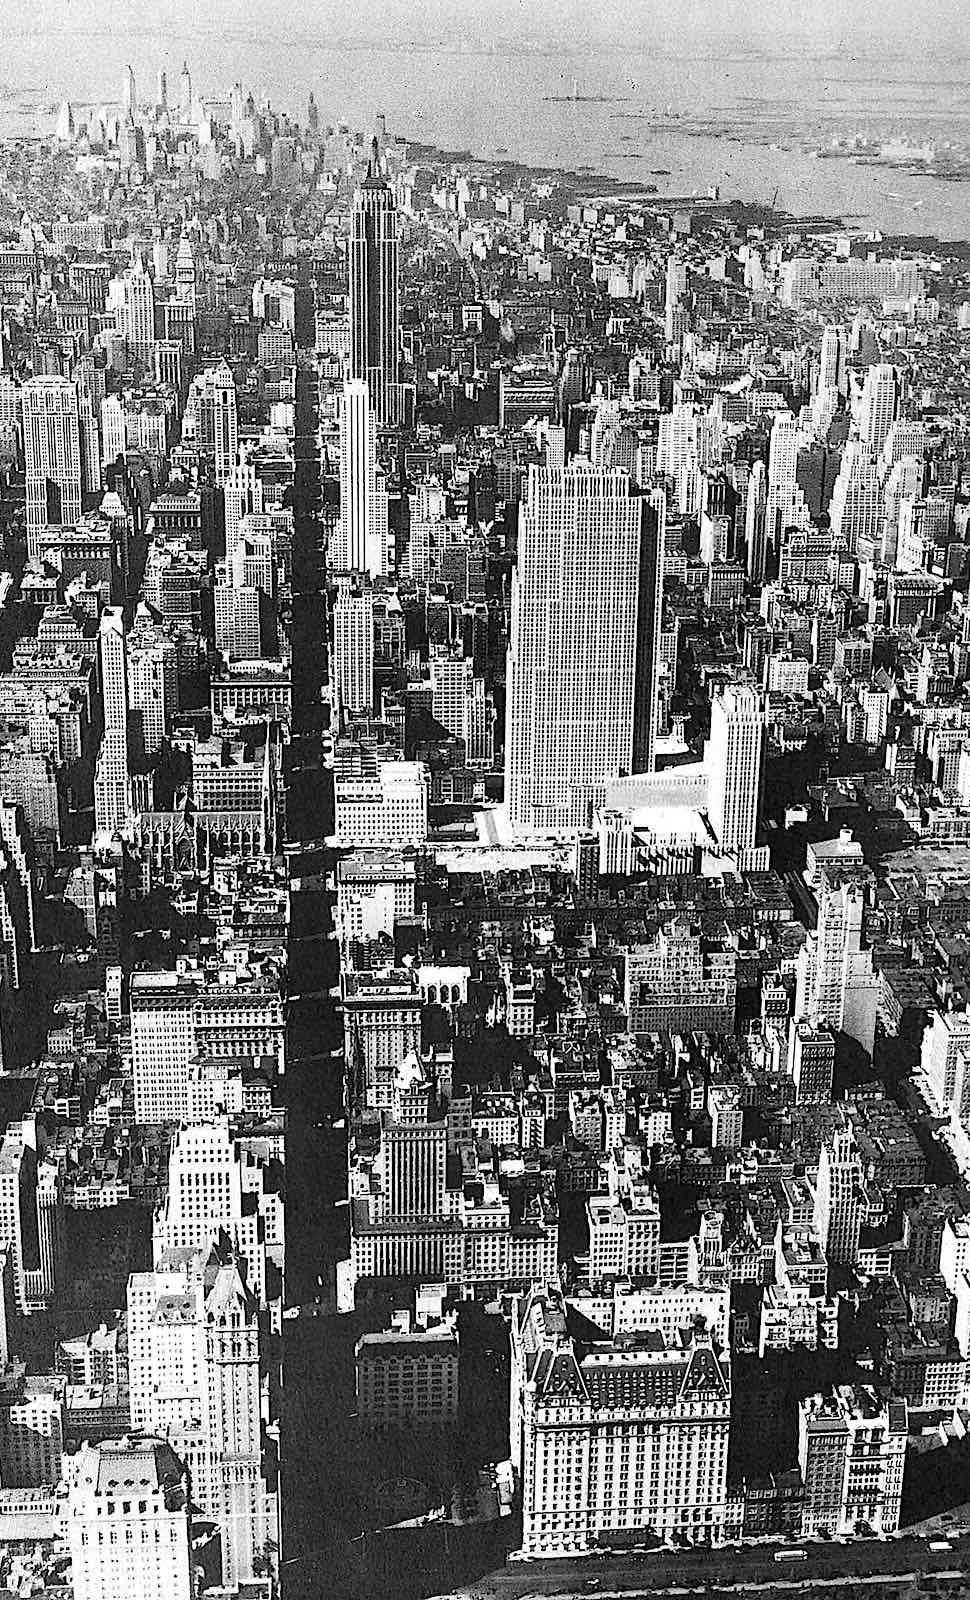 a birdseye photograph of New York in 1931